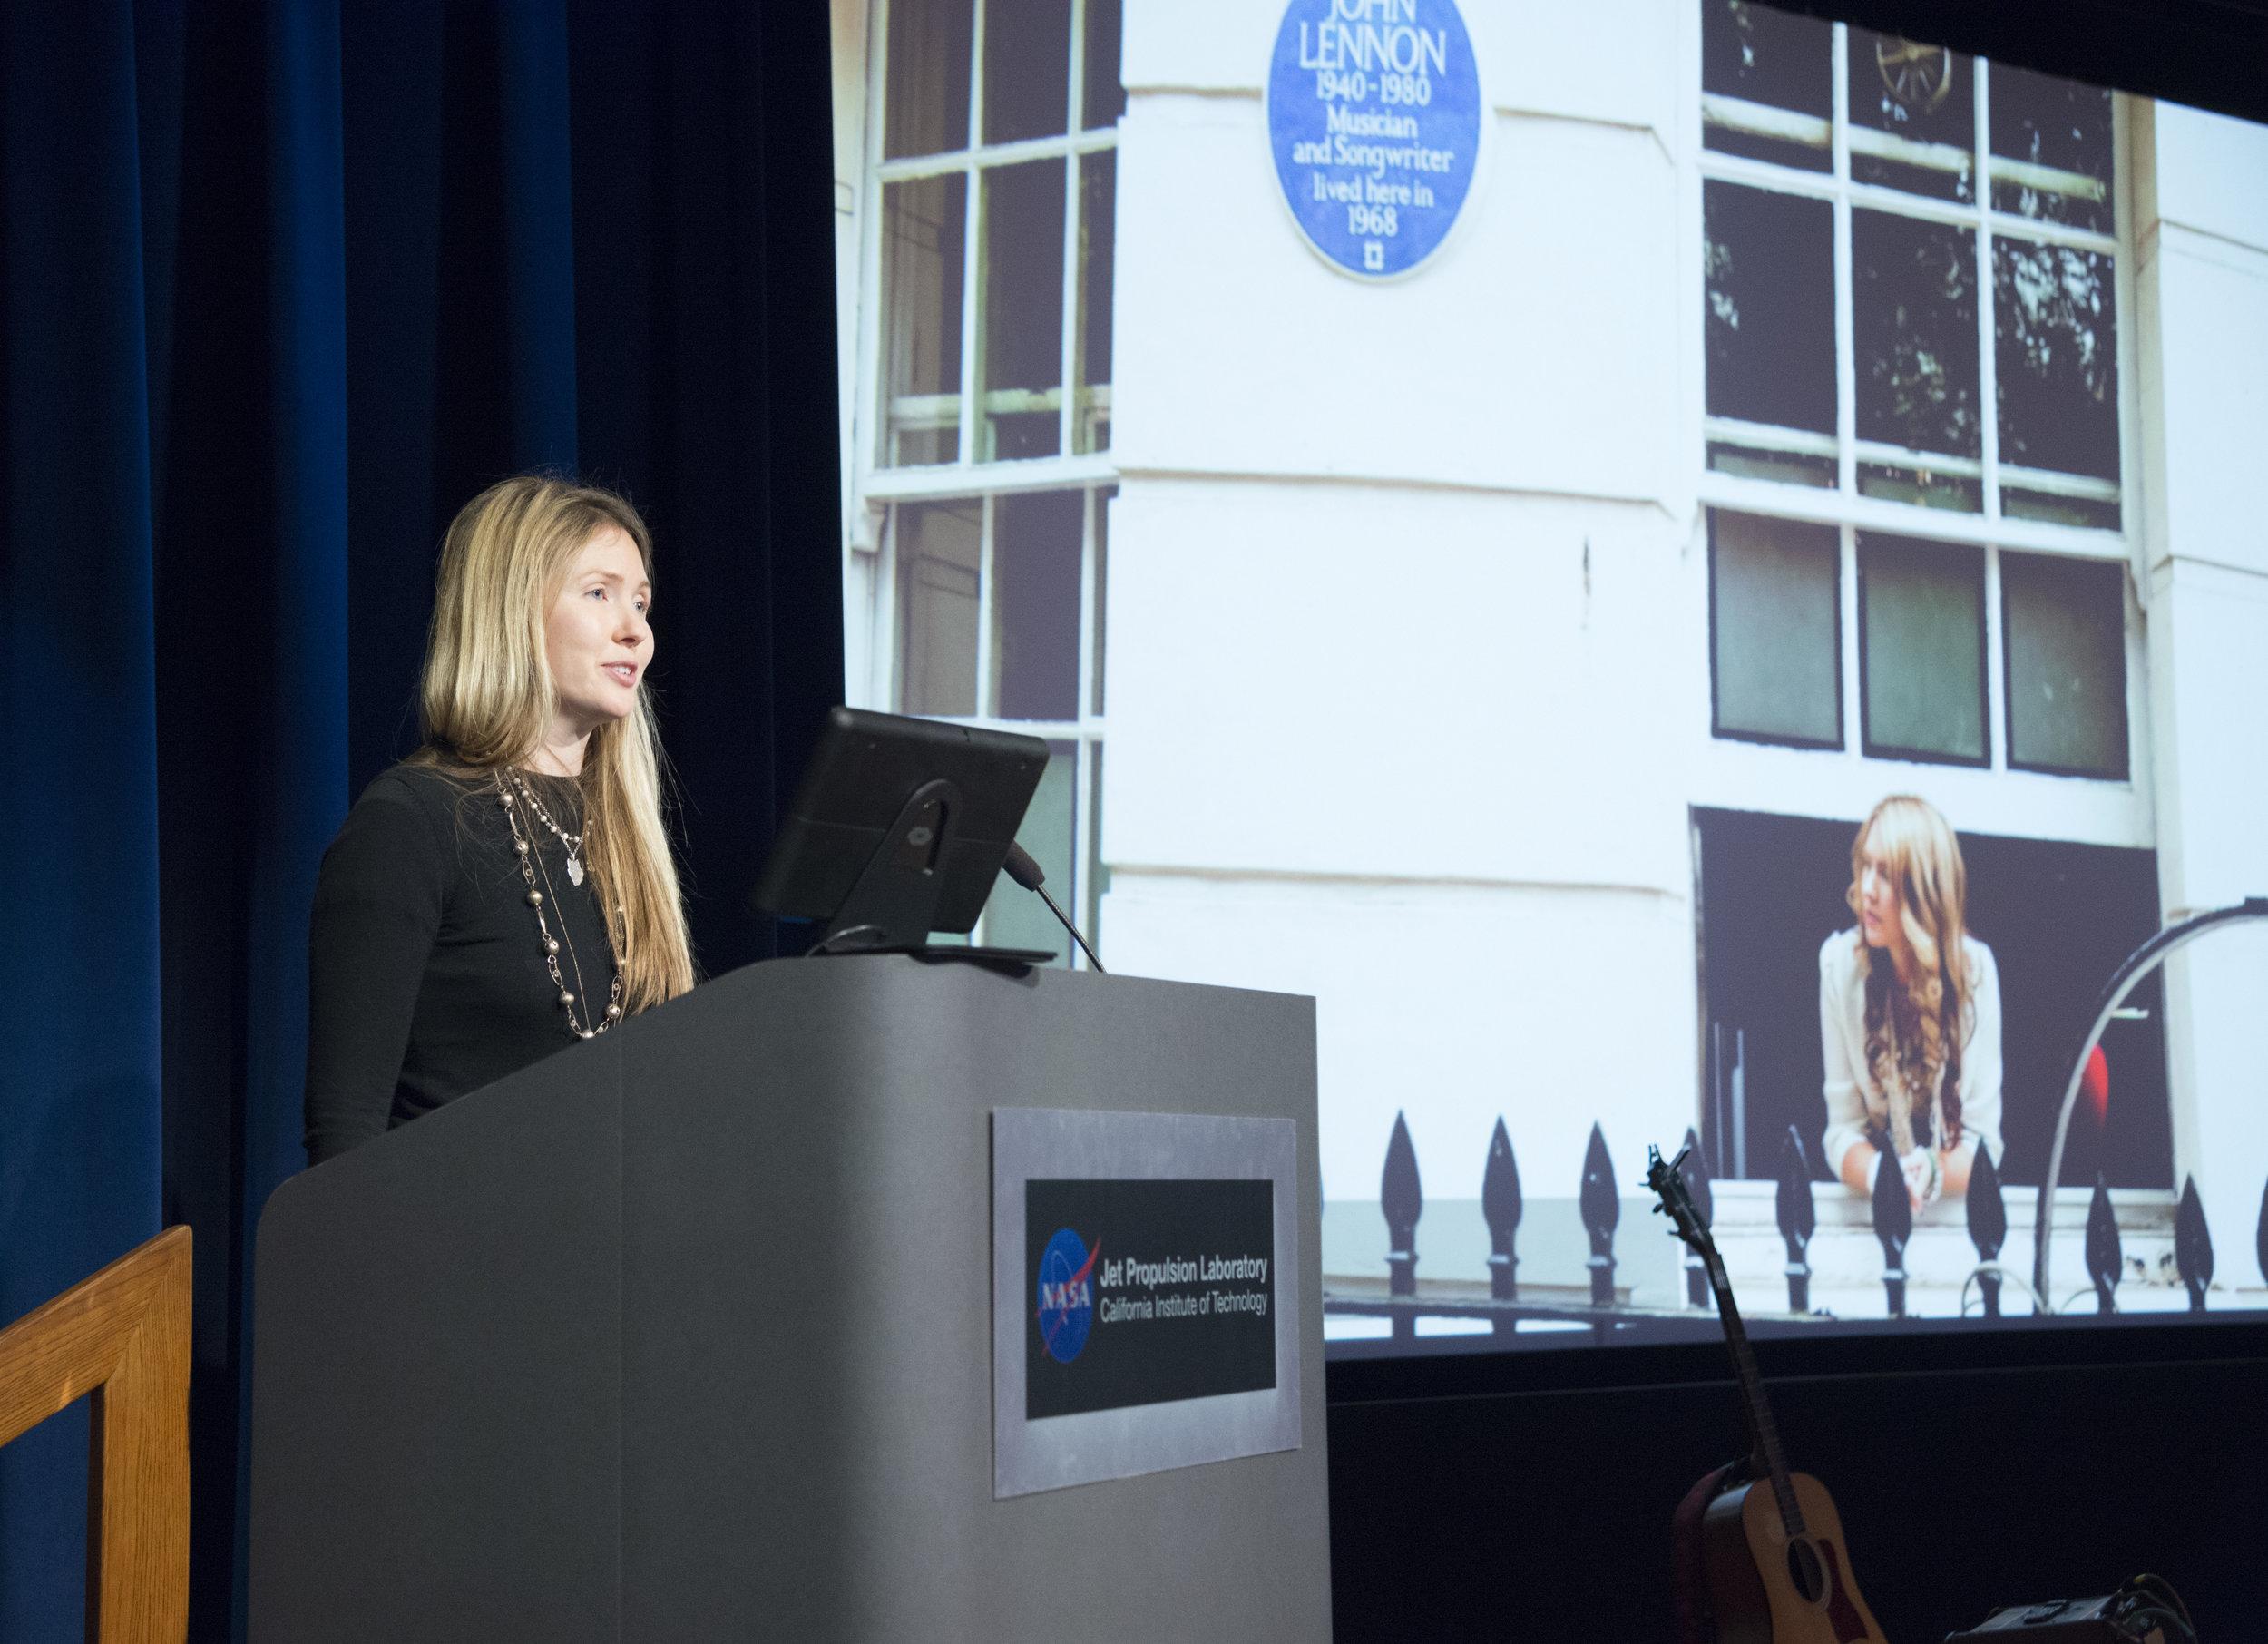 Beatie Wolfe - 2018 keynote & performance - NASA's JPL 2